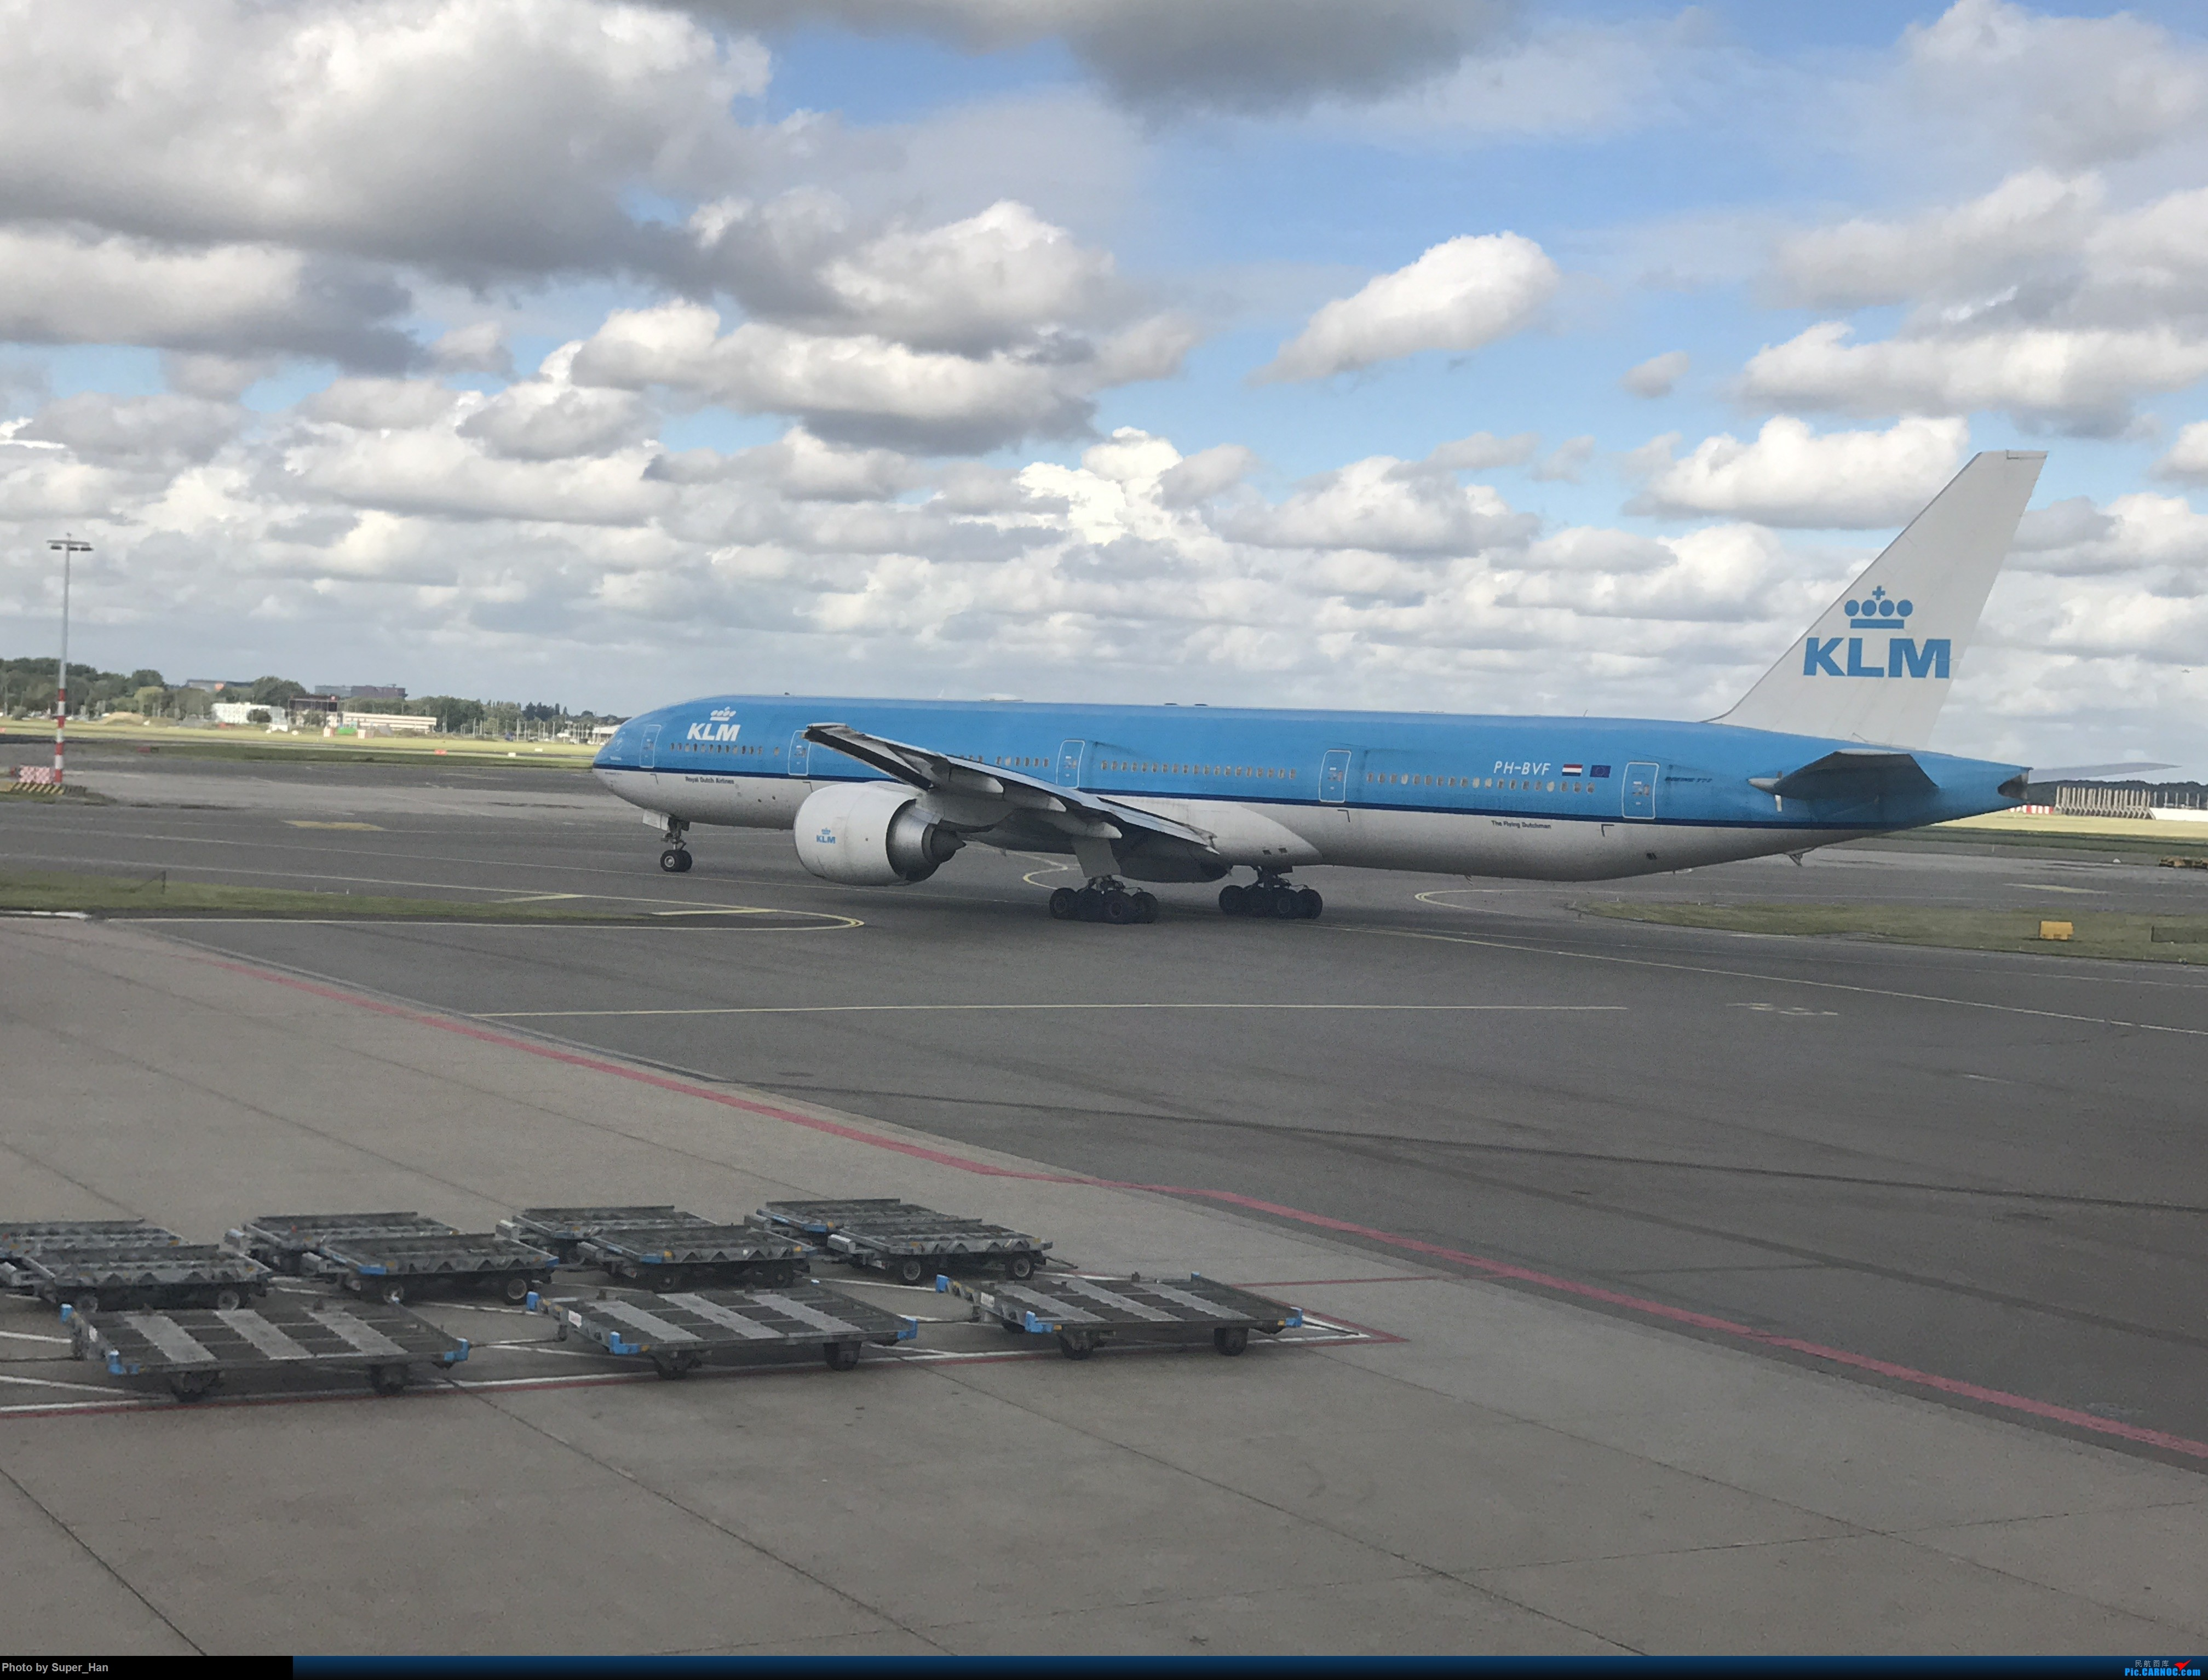 Re:[原创]PVG-AMS 第一次走进阿姆斯特丹史基浦机场! BOEING 777-300ER PH-BVF 荷兰阿姆斯特丹史基浦机场